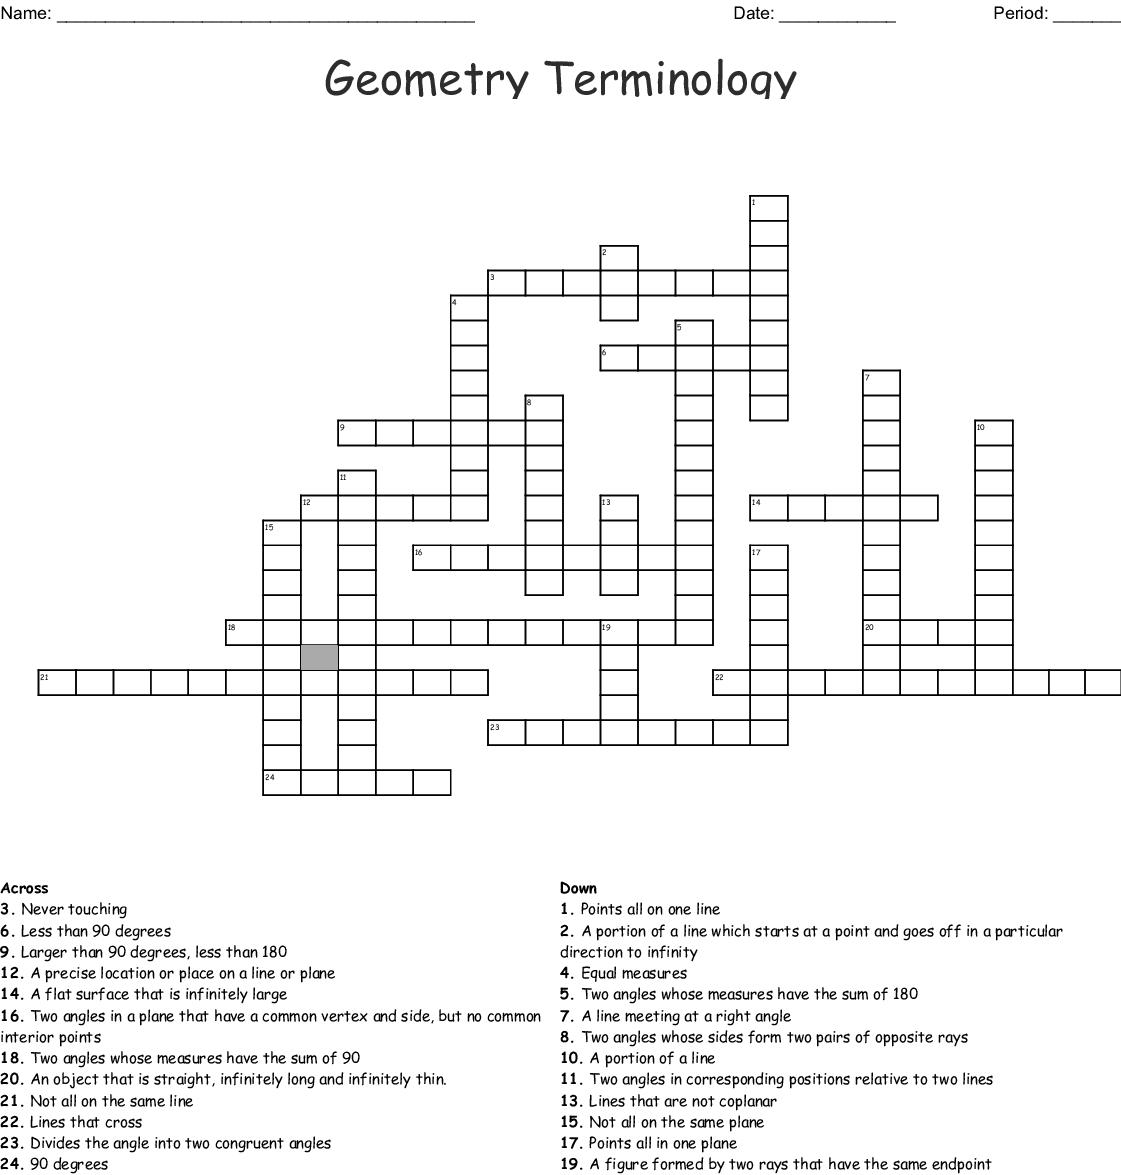 Geometry Terminology Crossword - WordMint